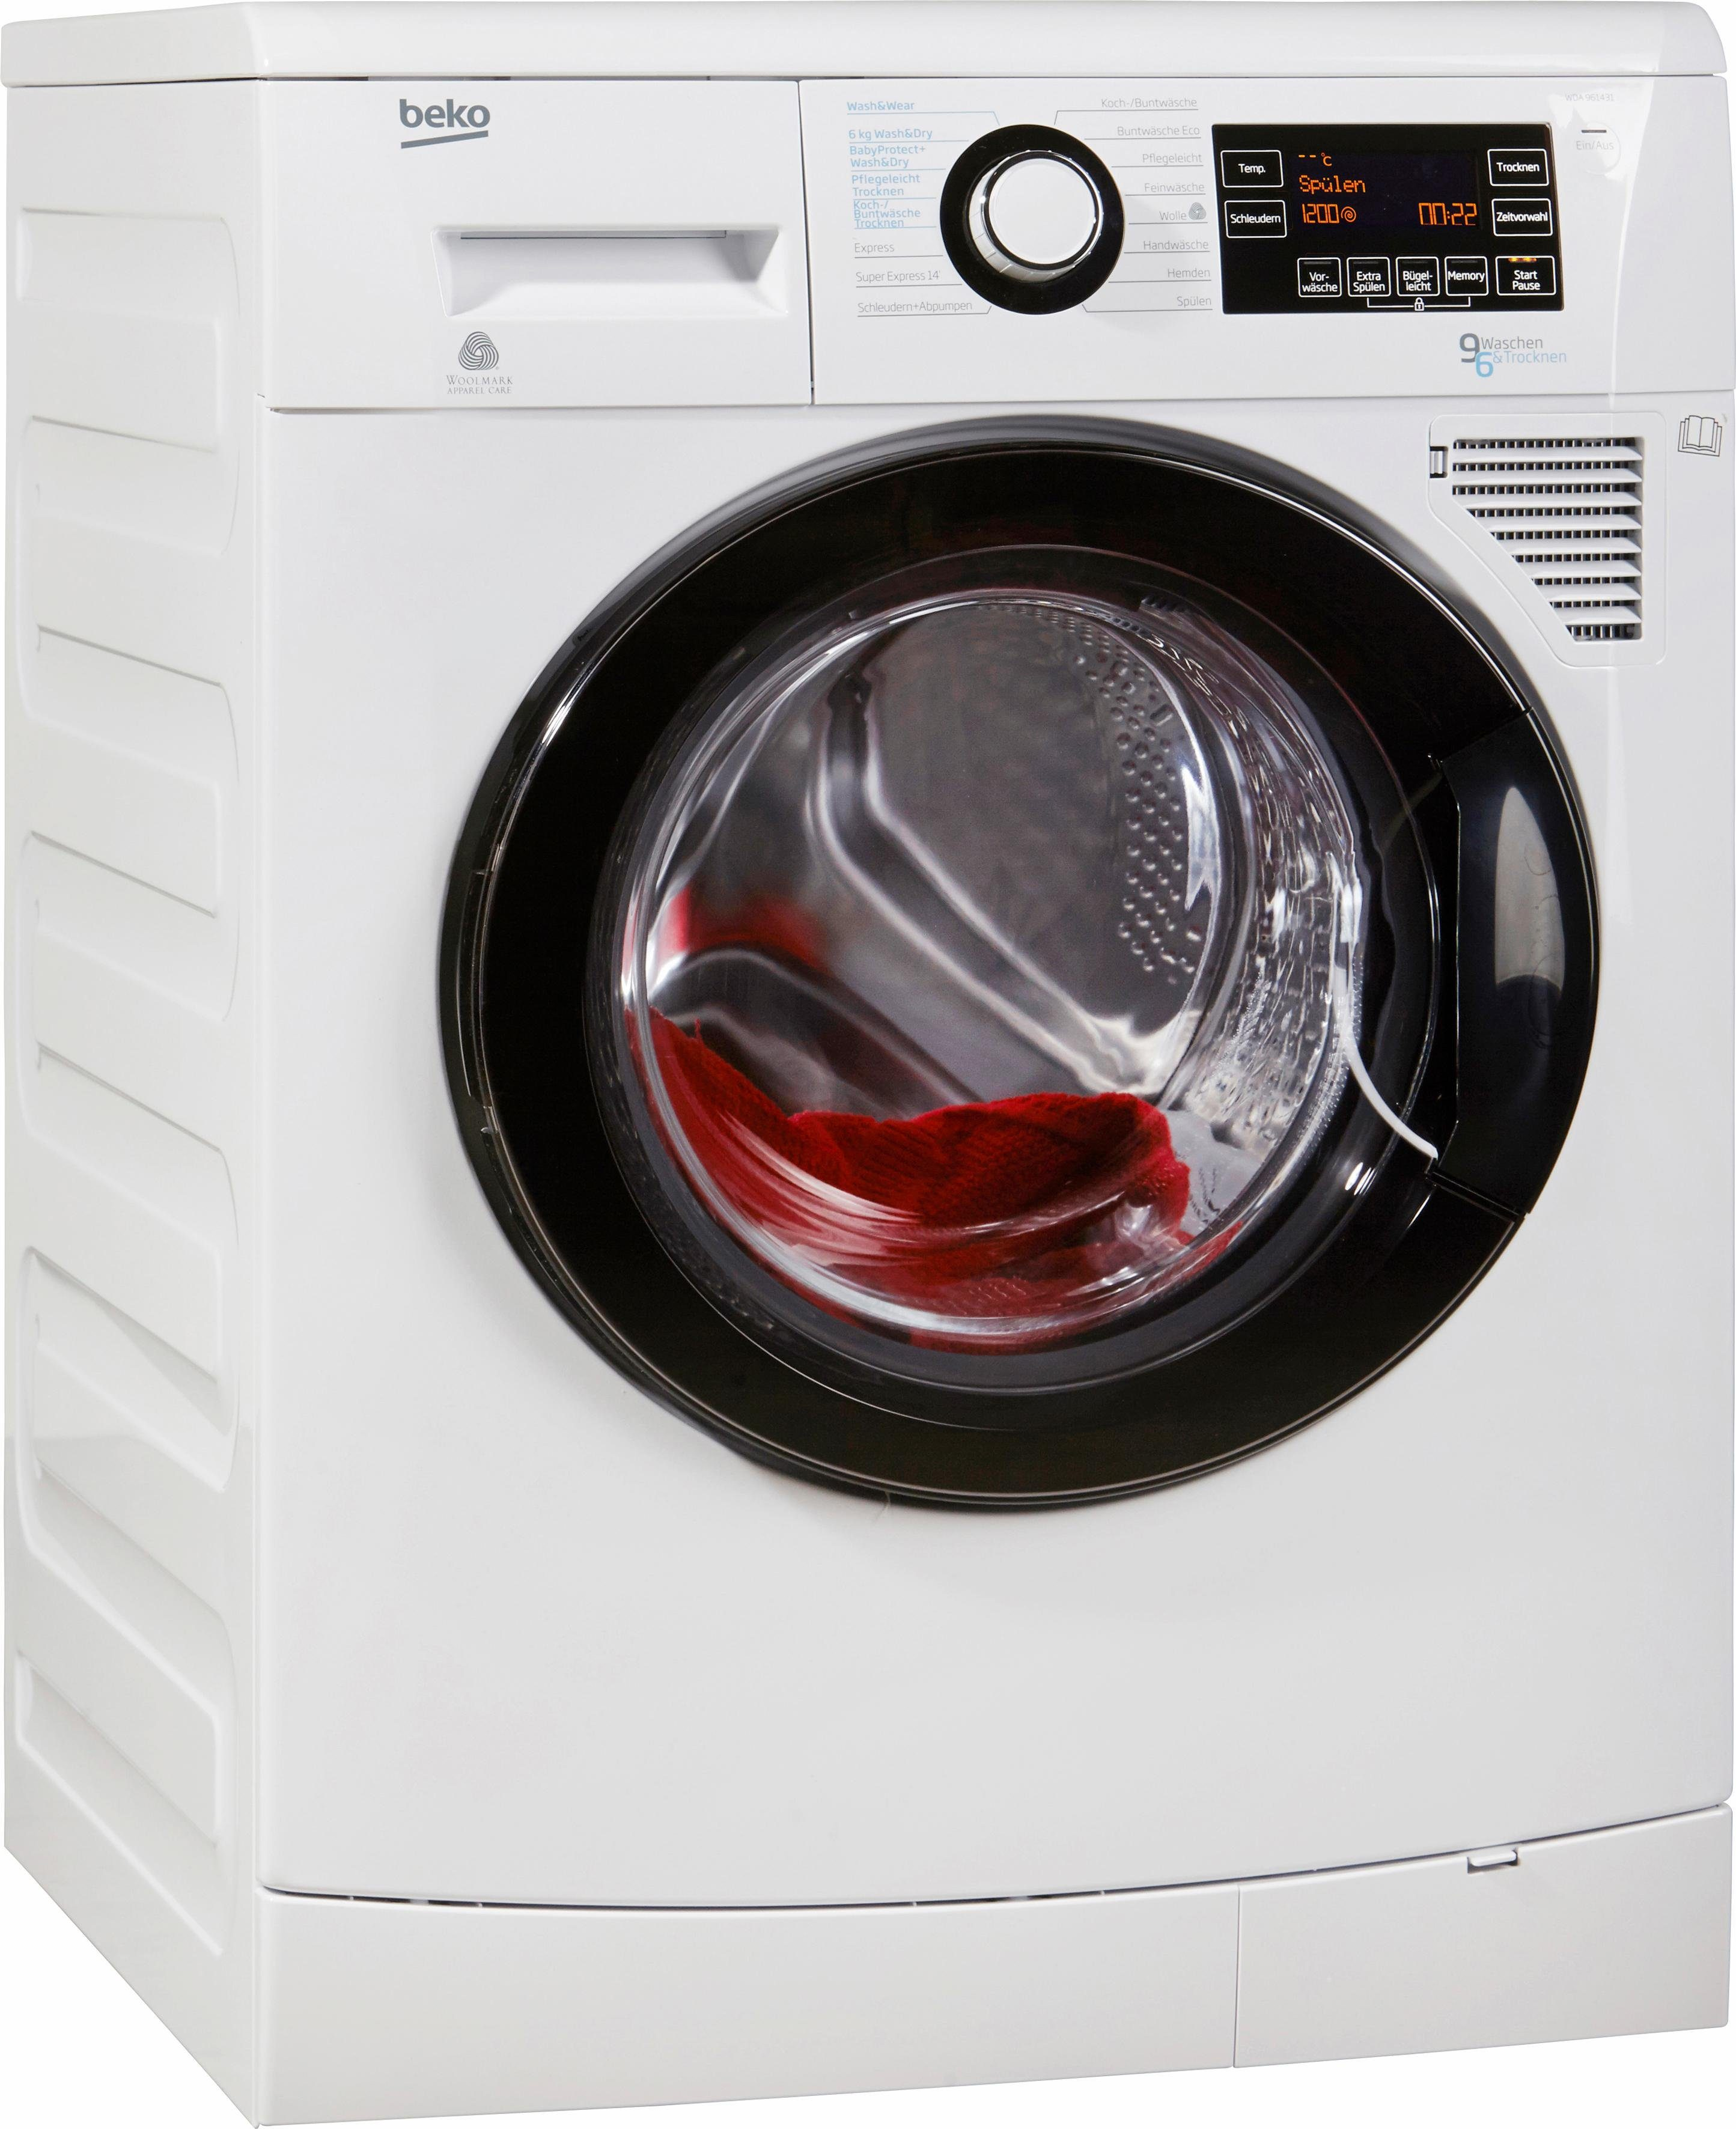 BEKO Waschtrockner WDA 961431, A, 9 kg / 6 kg, 1.400 U/Min